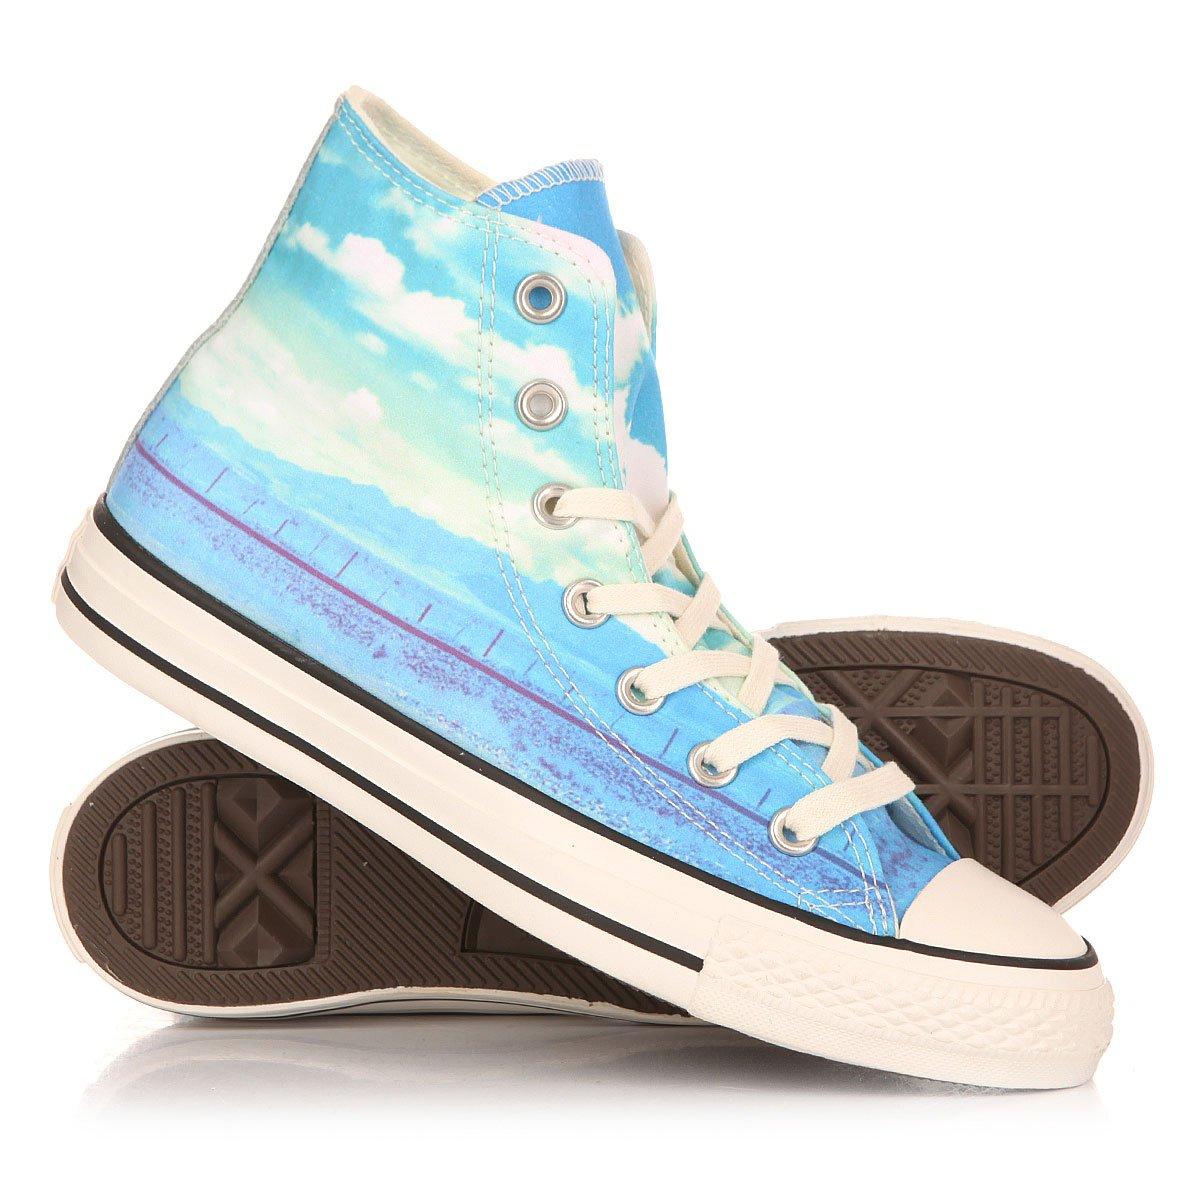 Кеды высокие женские Converse Chuck Taylor All Star Hi Spray Paint. до 0° abf22a6029086